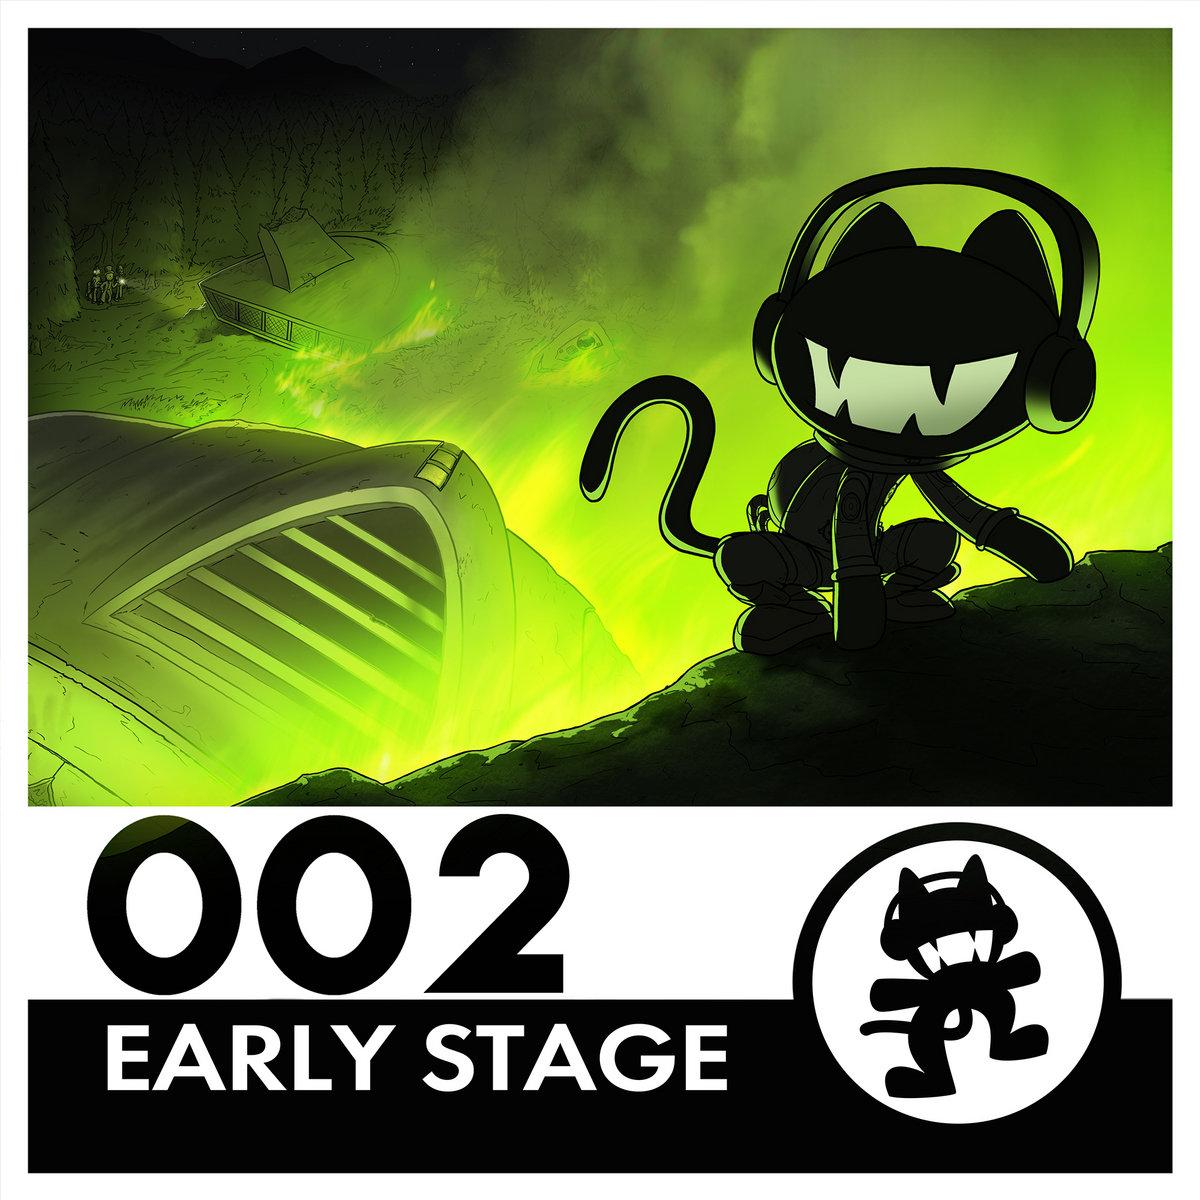 monstercat 002 early stage monstercat